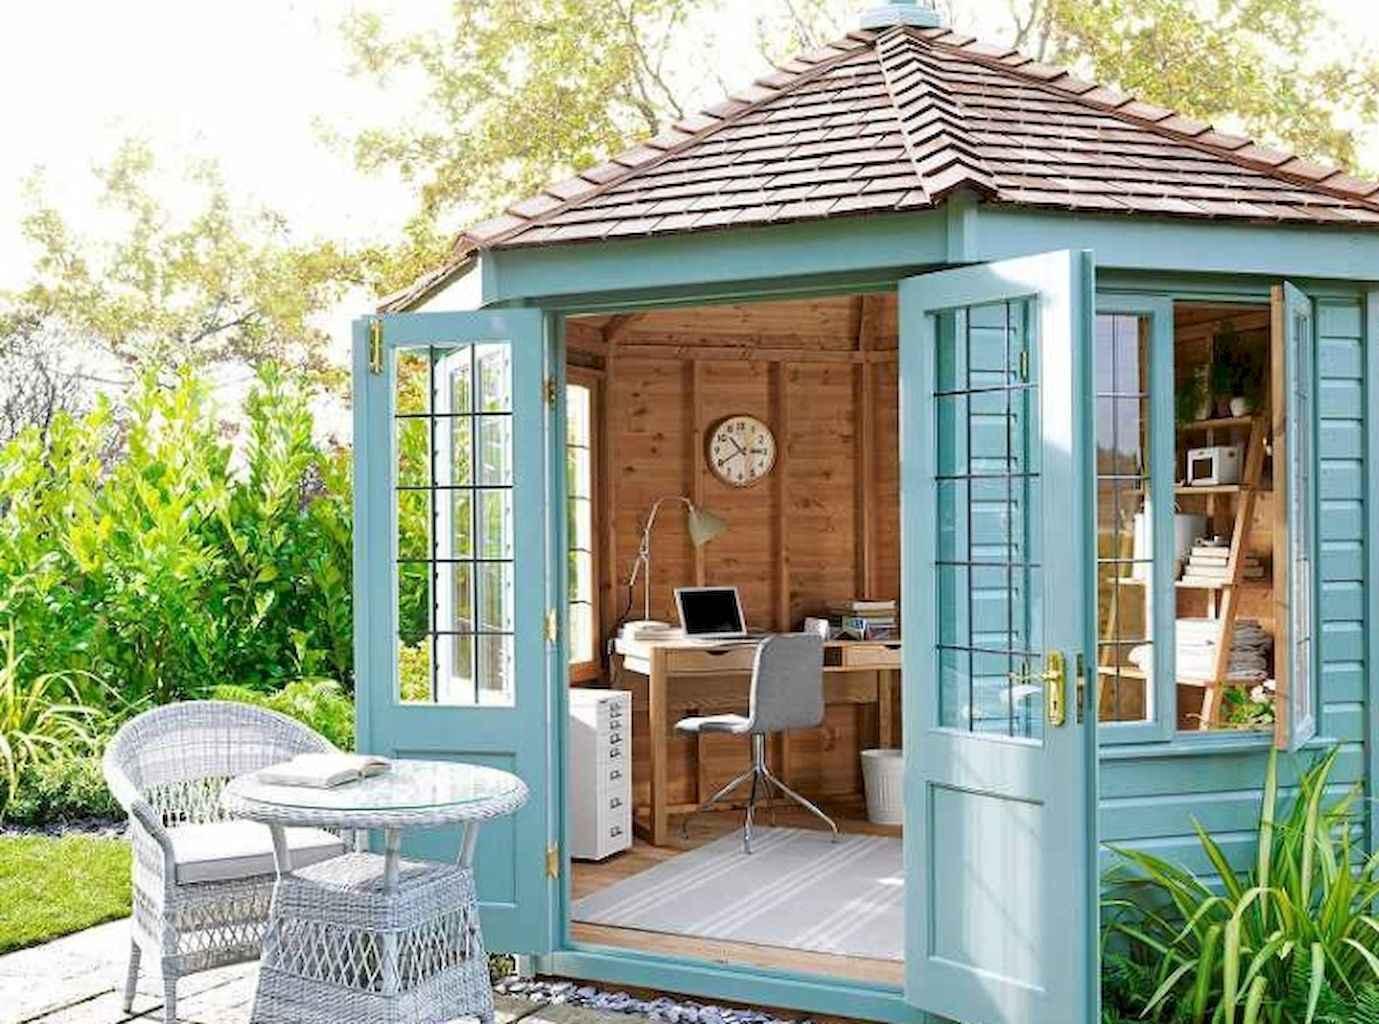 Cool diy backyard studio shed remodel design & decor ideas (11)